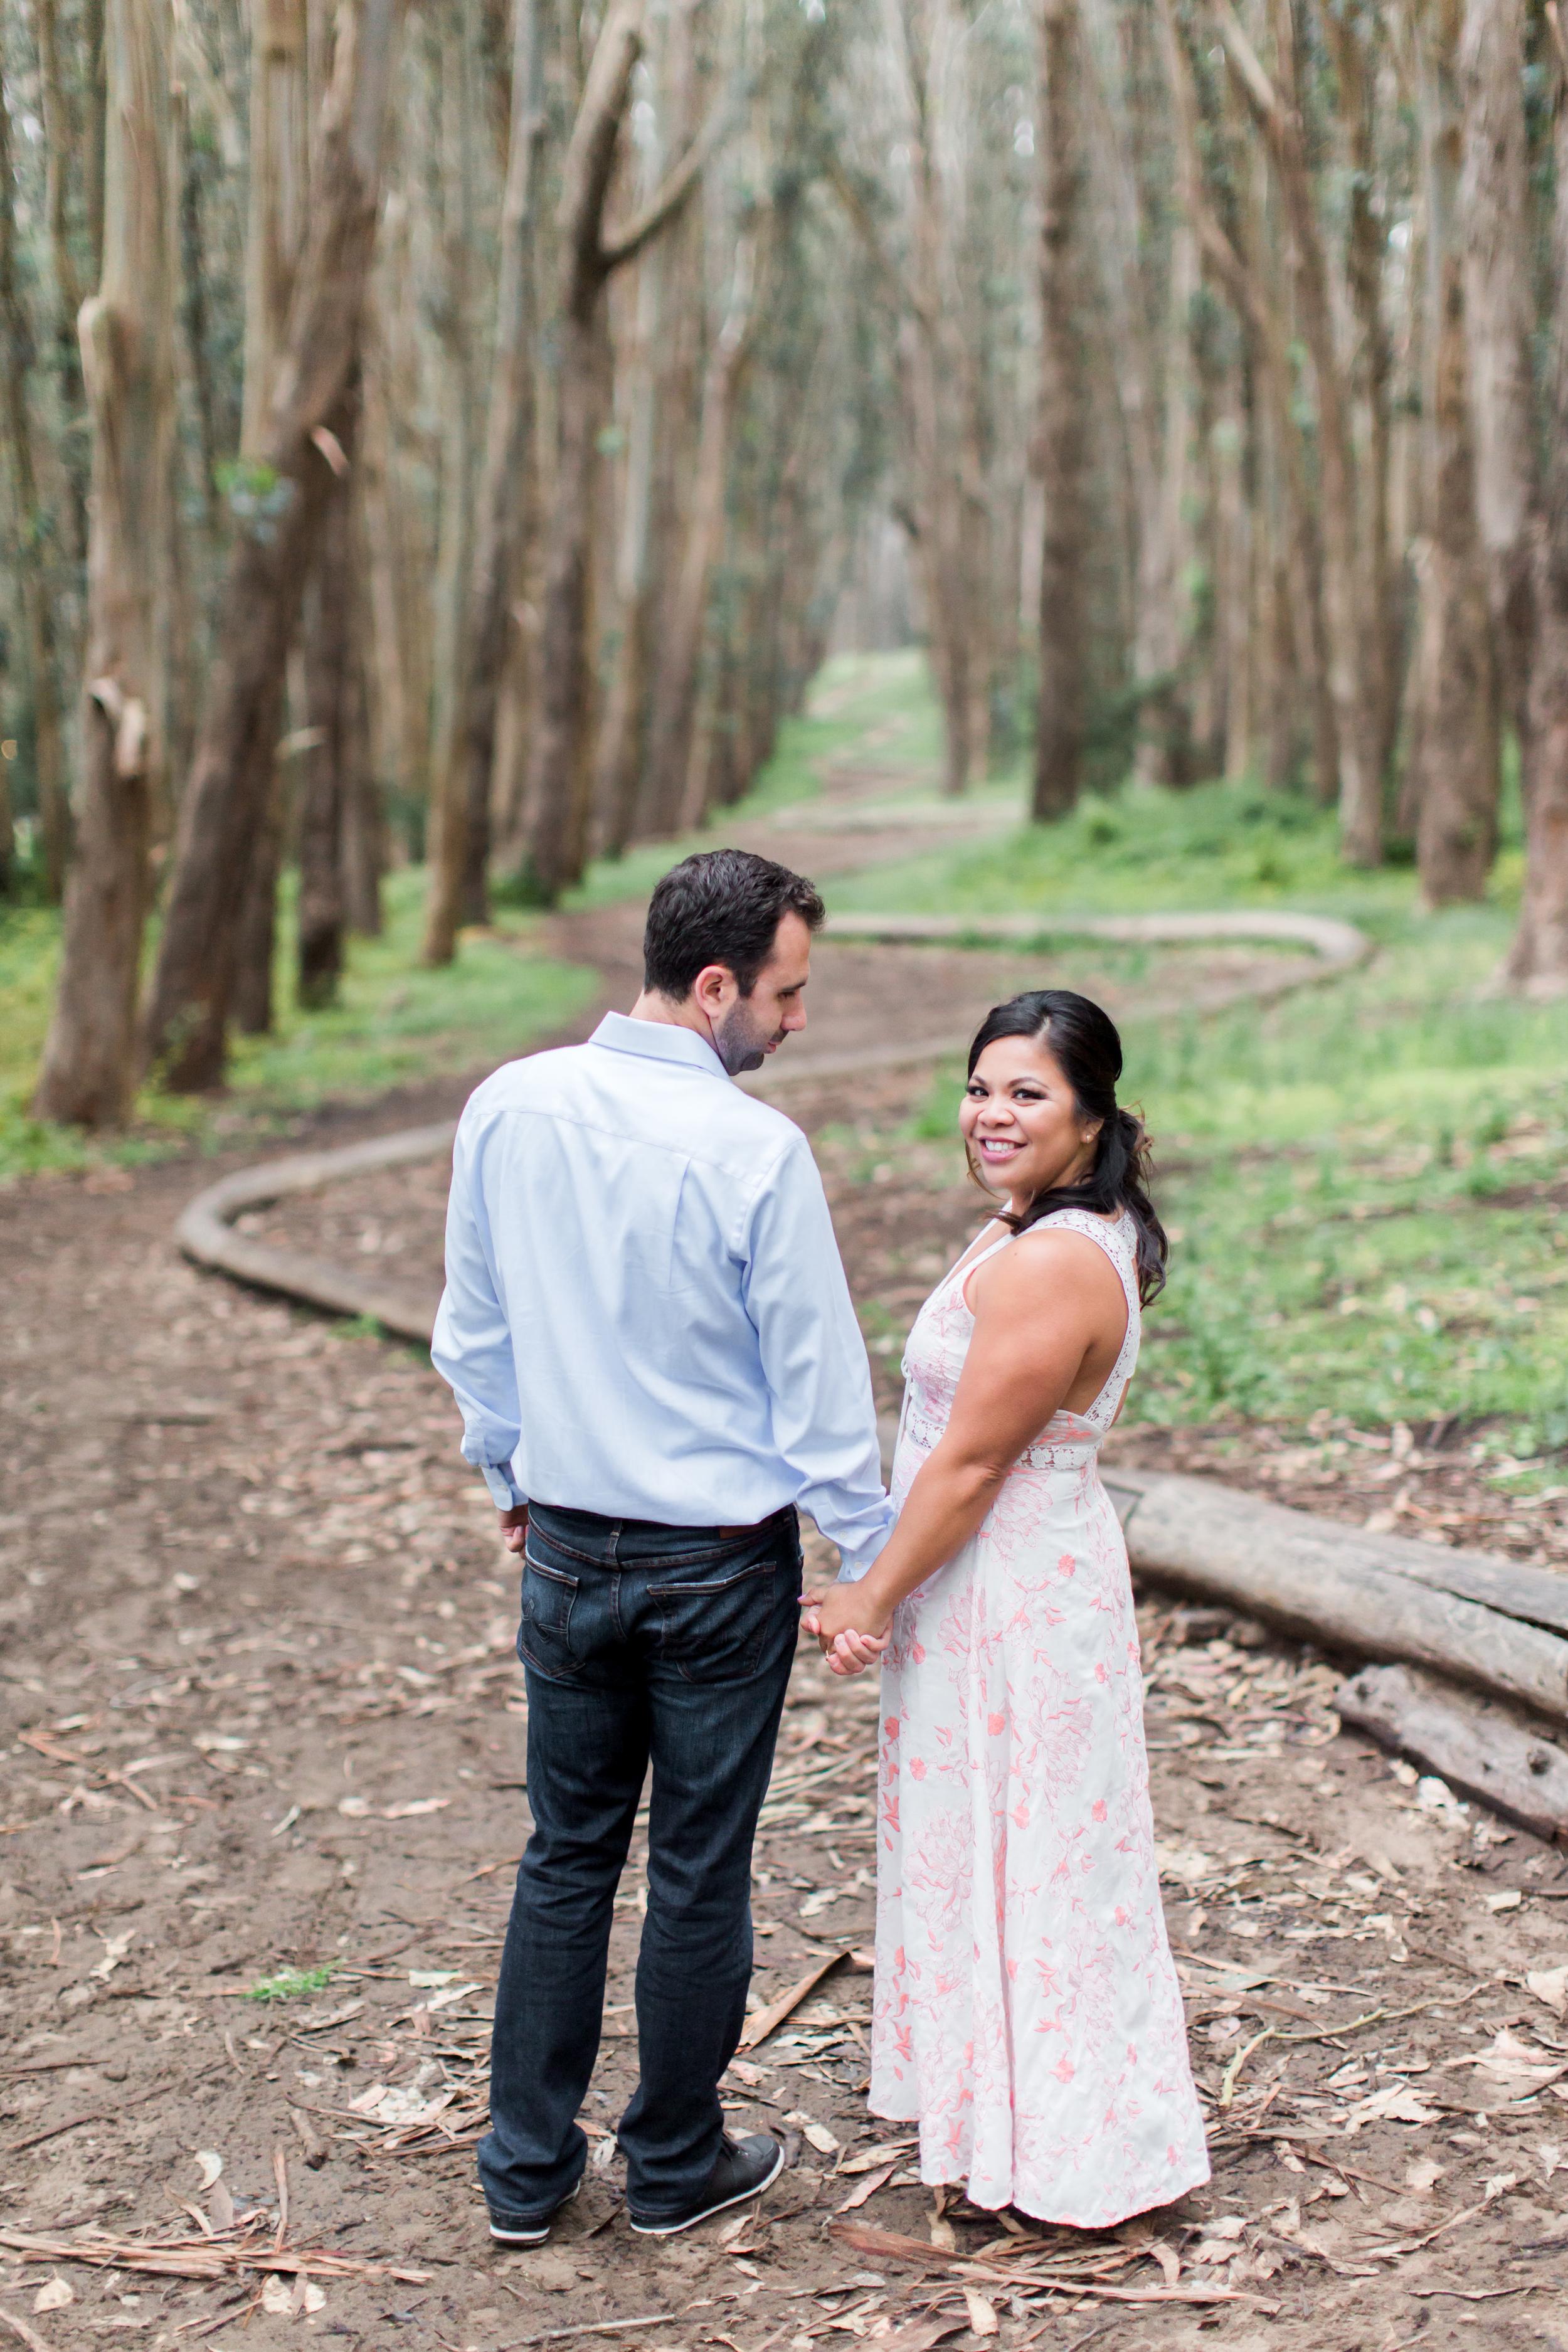 lovers-lane-san-francisco-engagement-photography.jpg